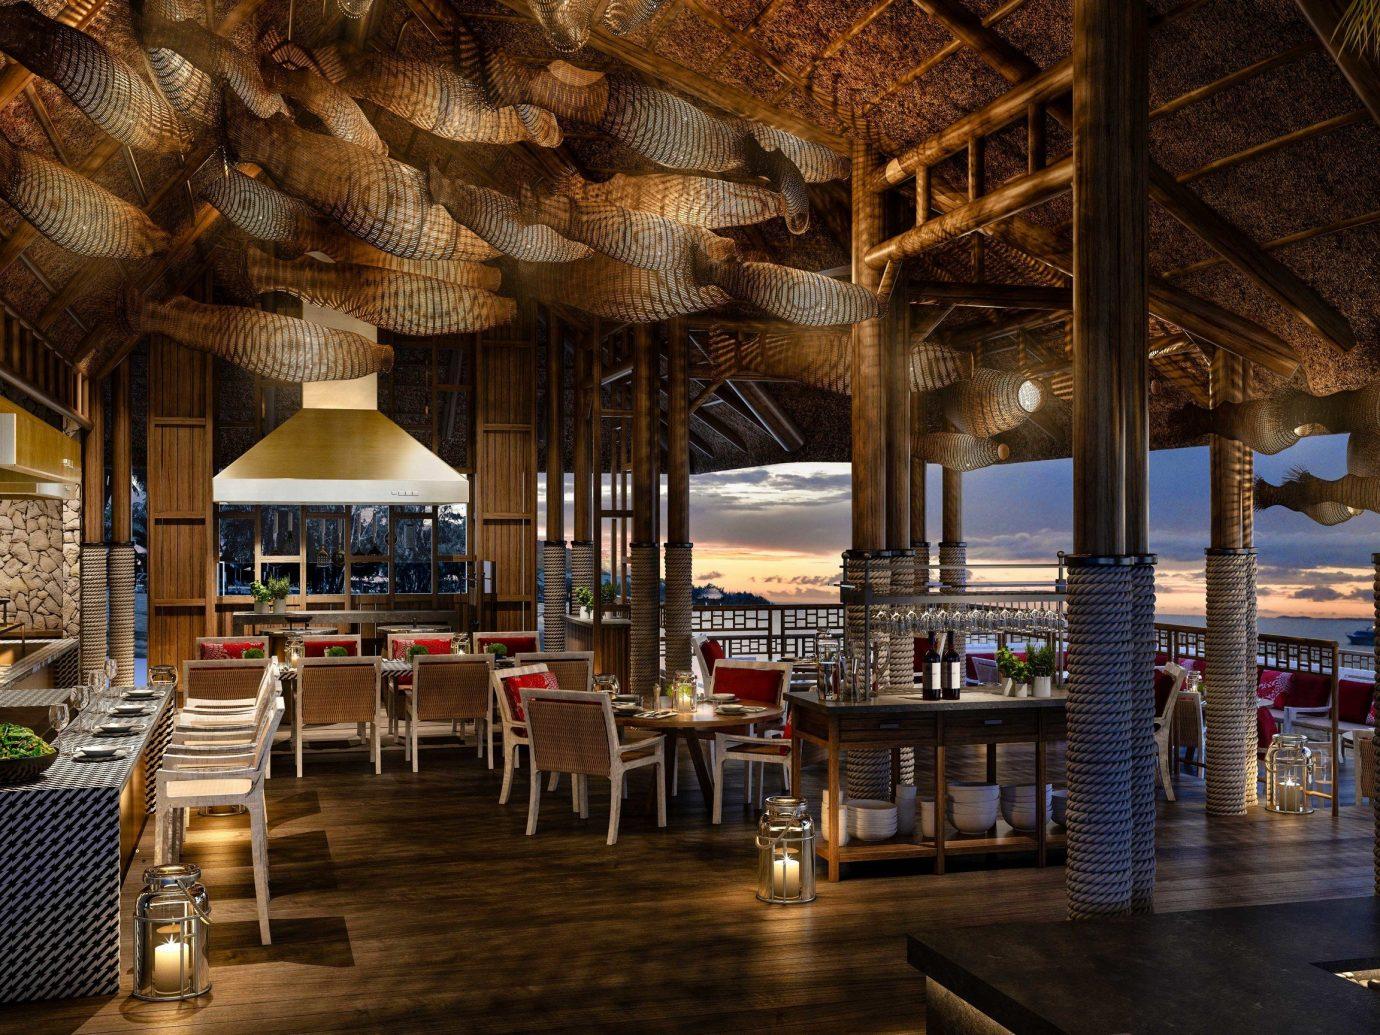 Trip Ideas chair indoor restaurant interior design Resort furniture